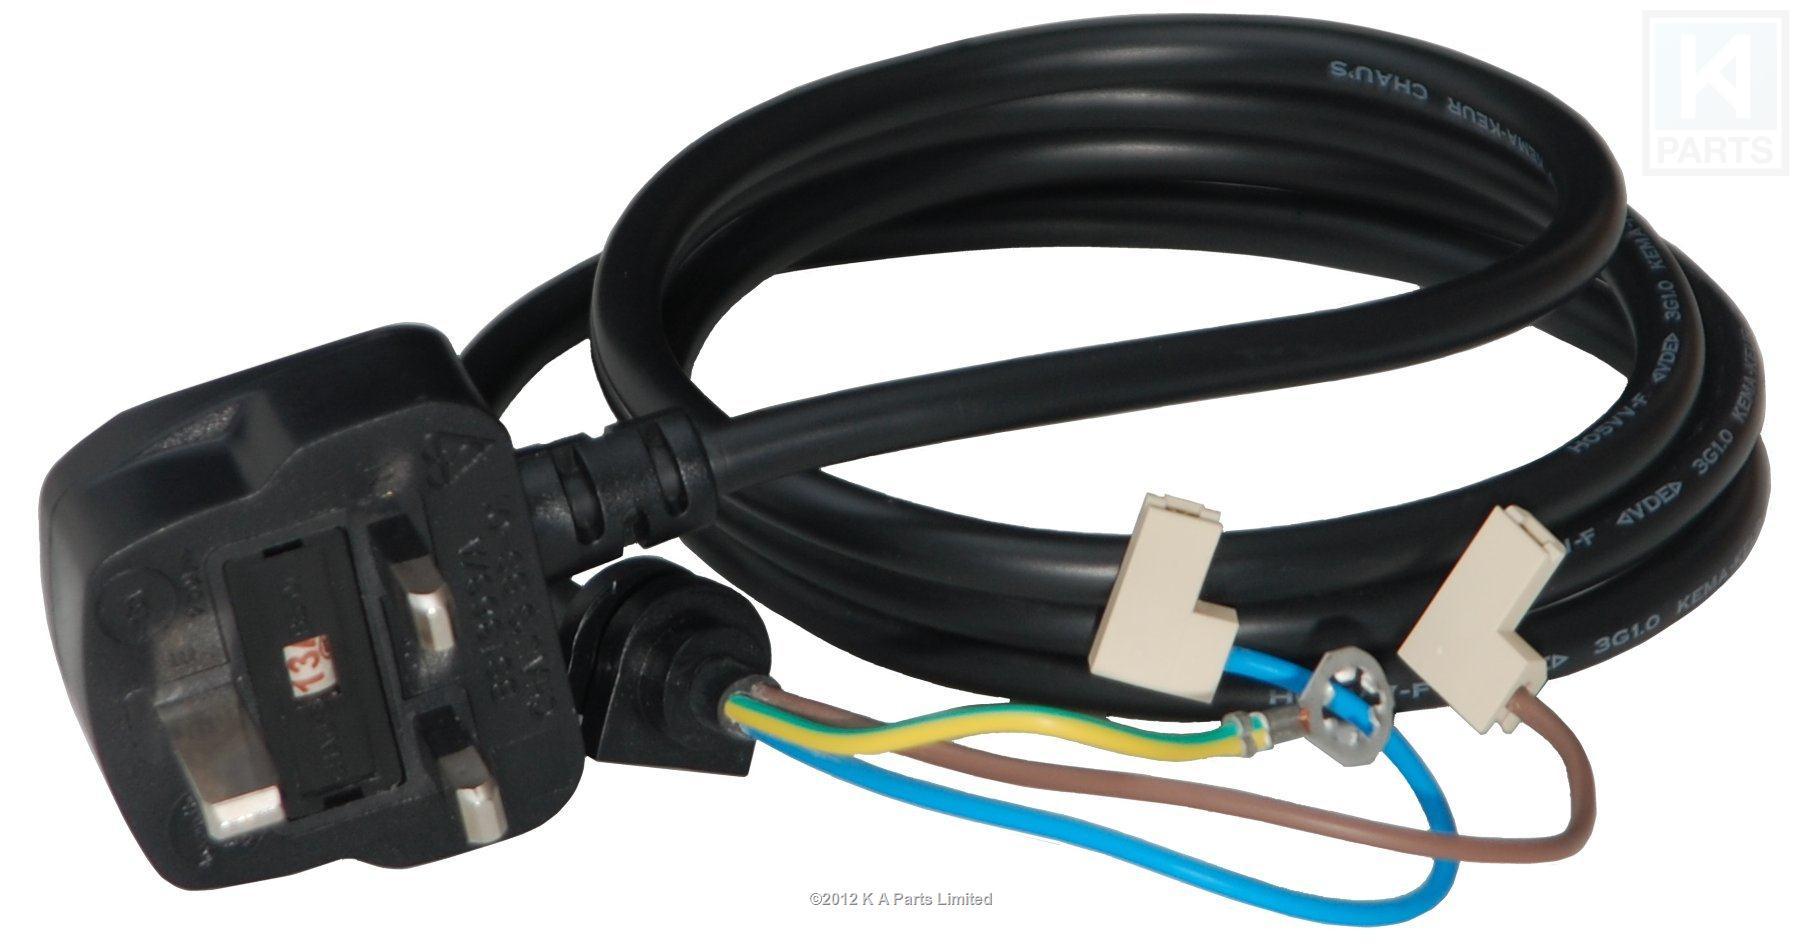 Kitchenaid outlet uk inspirierendes design for Ecksofa cord